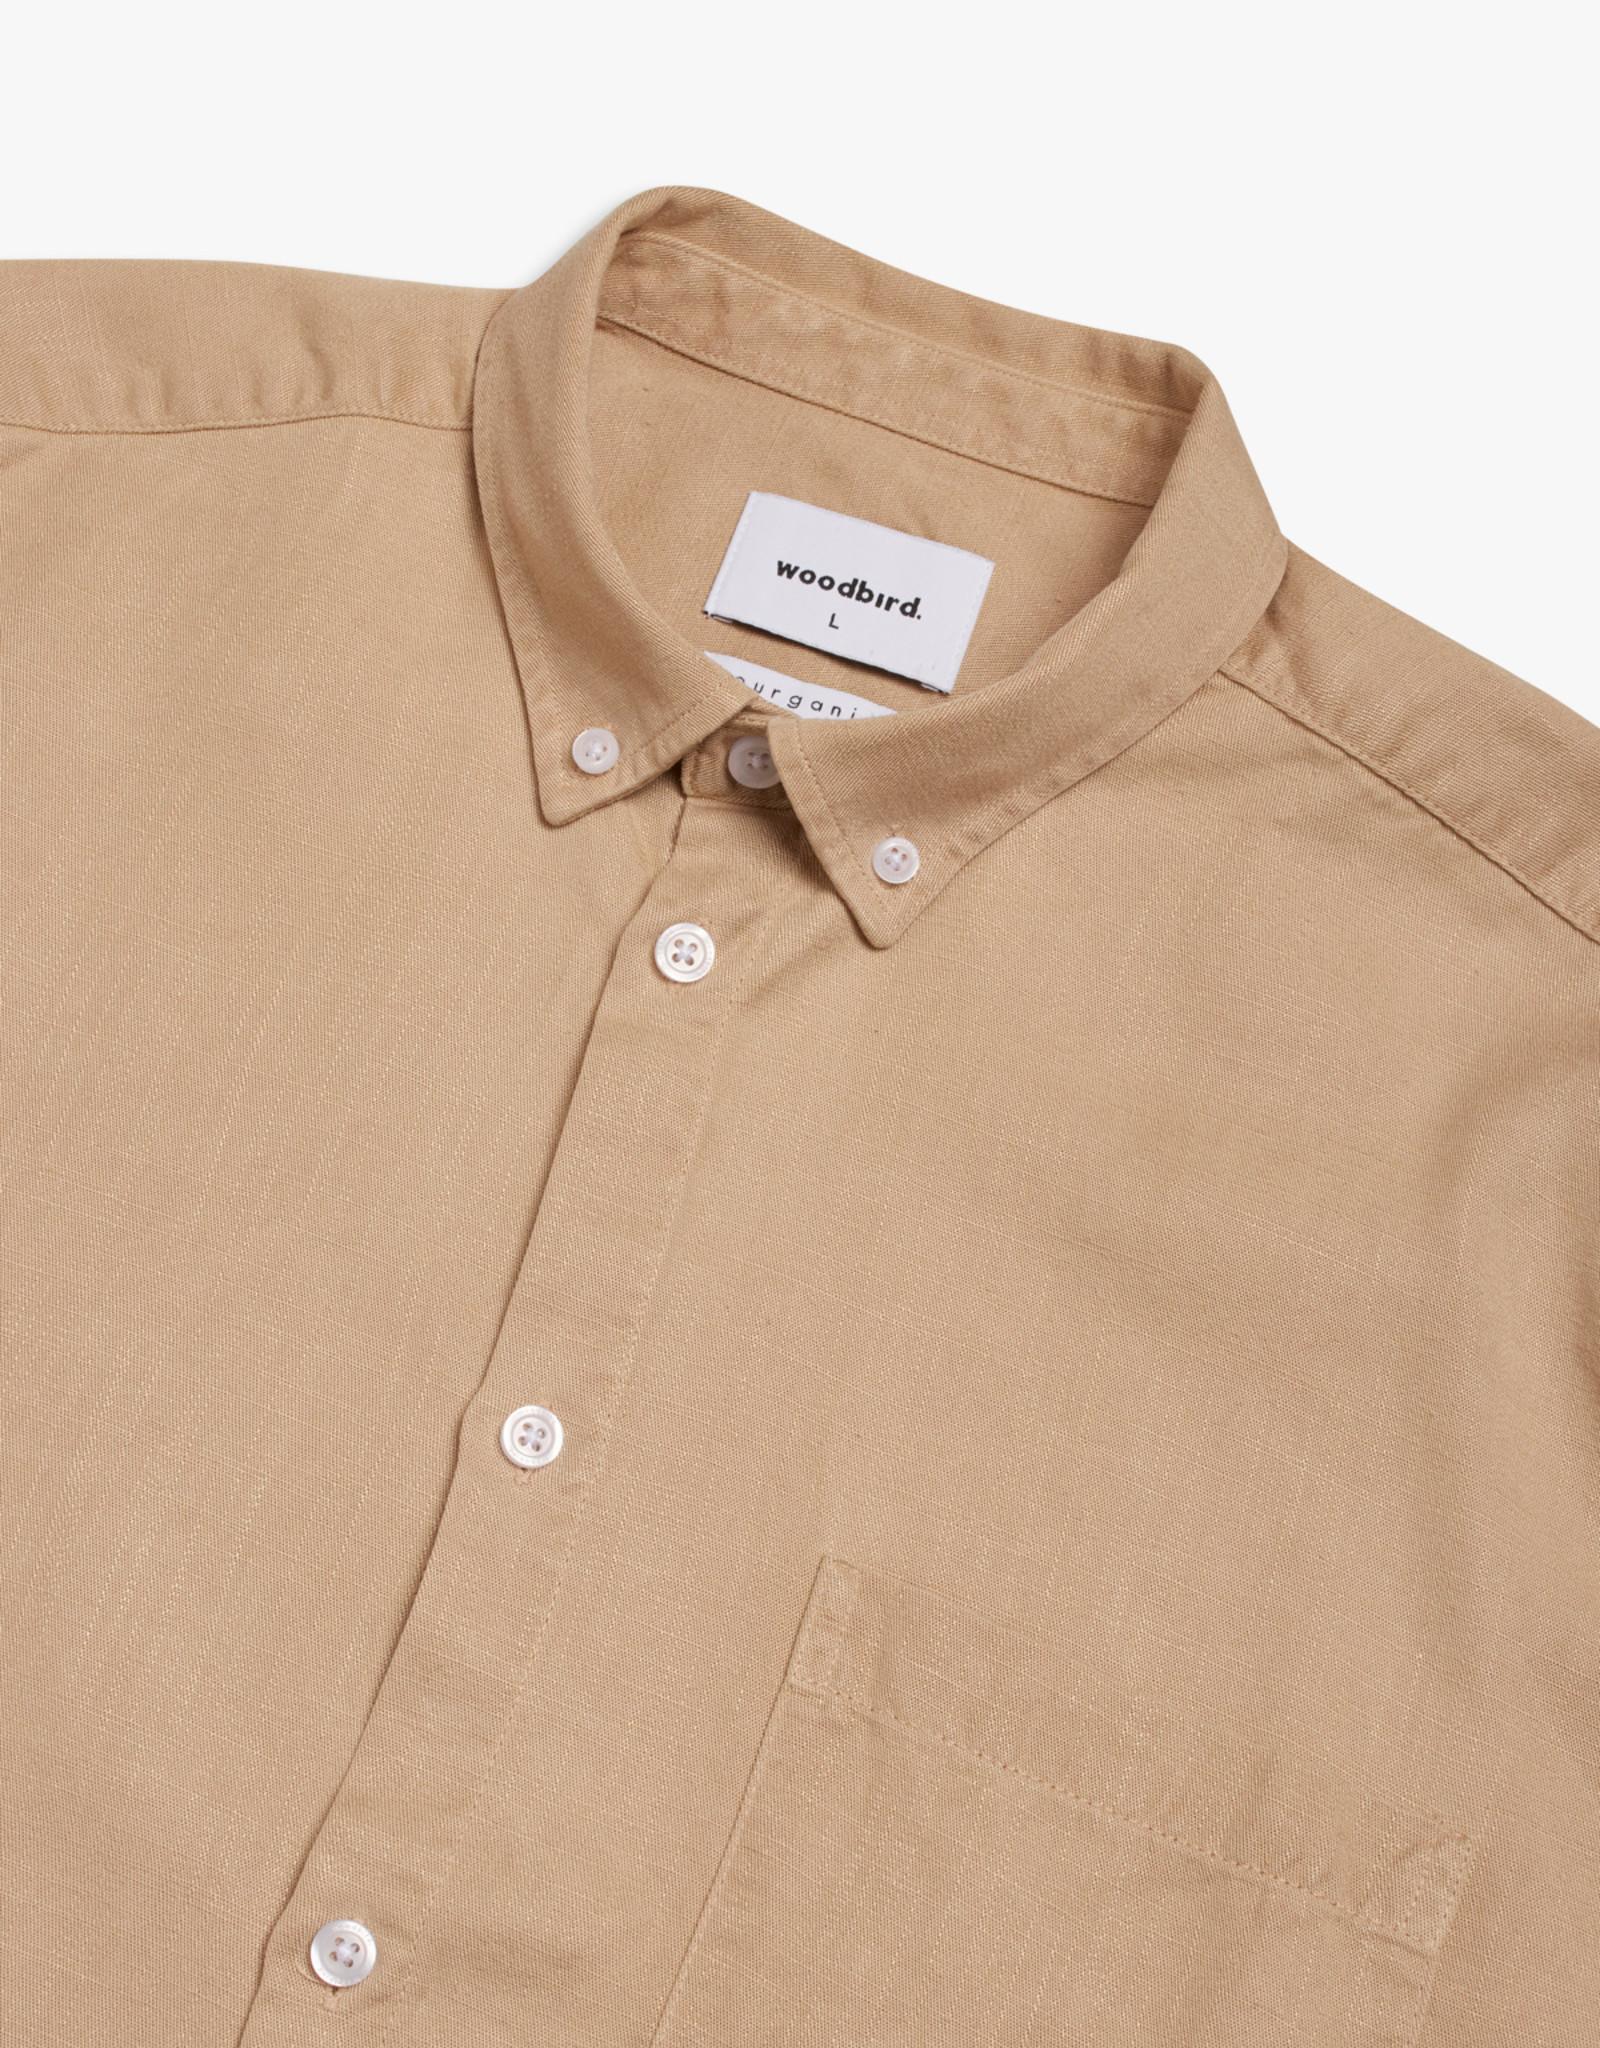 Woodbird AW20-7-WB-Sike Shirt